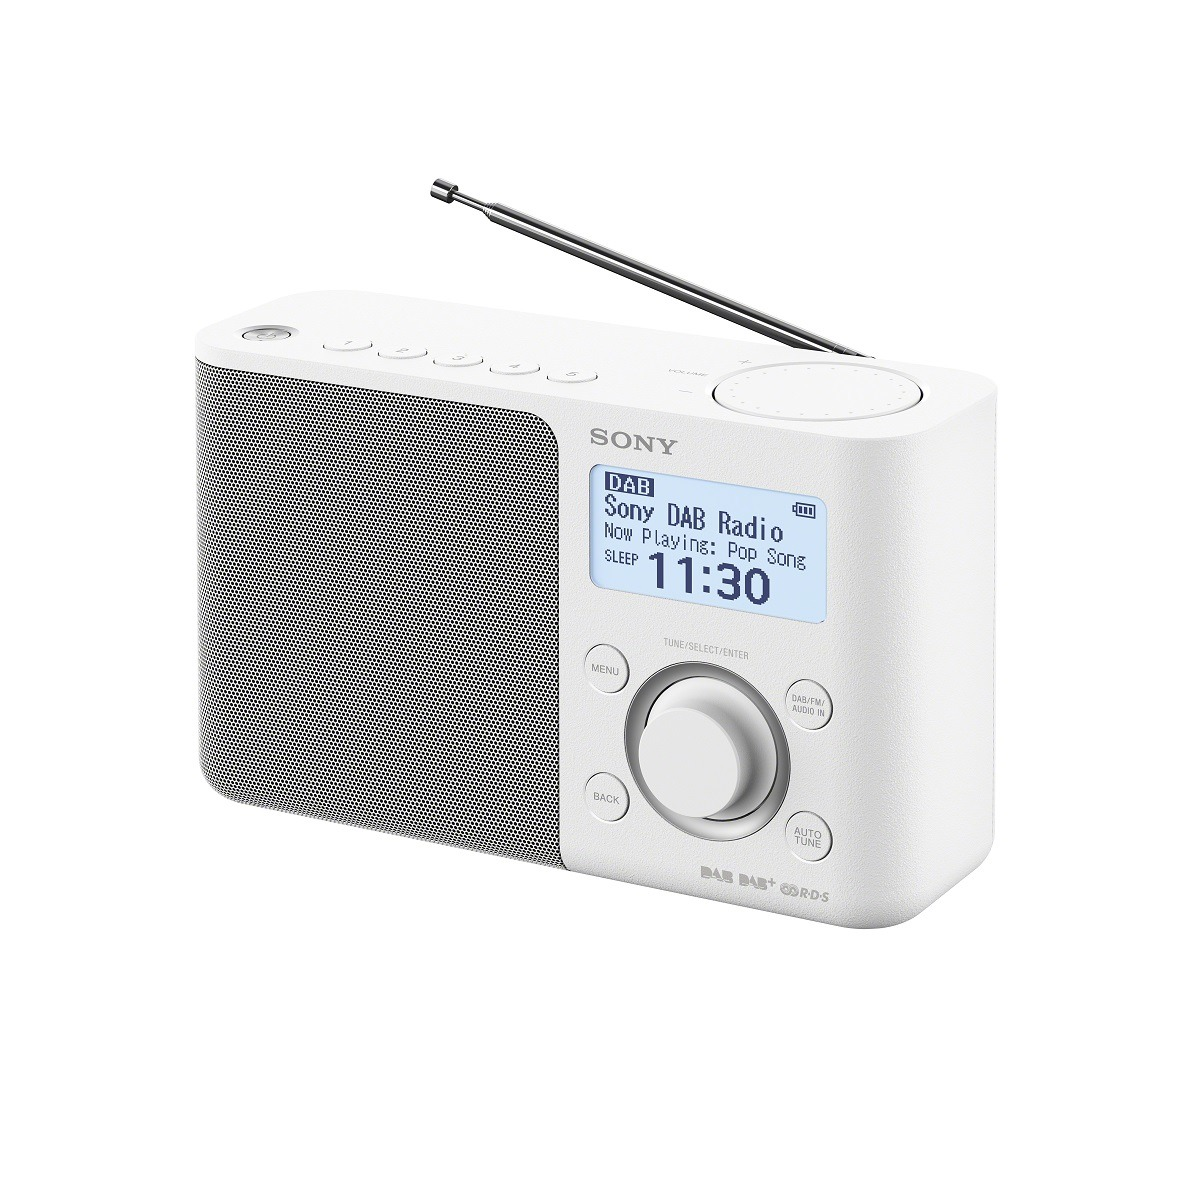 Korting Sony XDR S61D dab radio